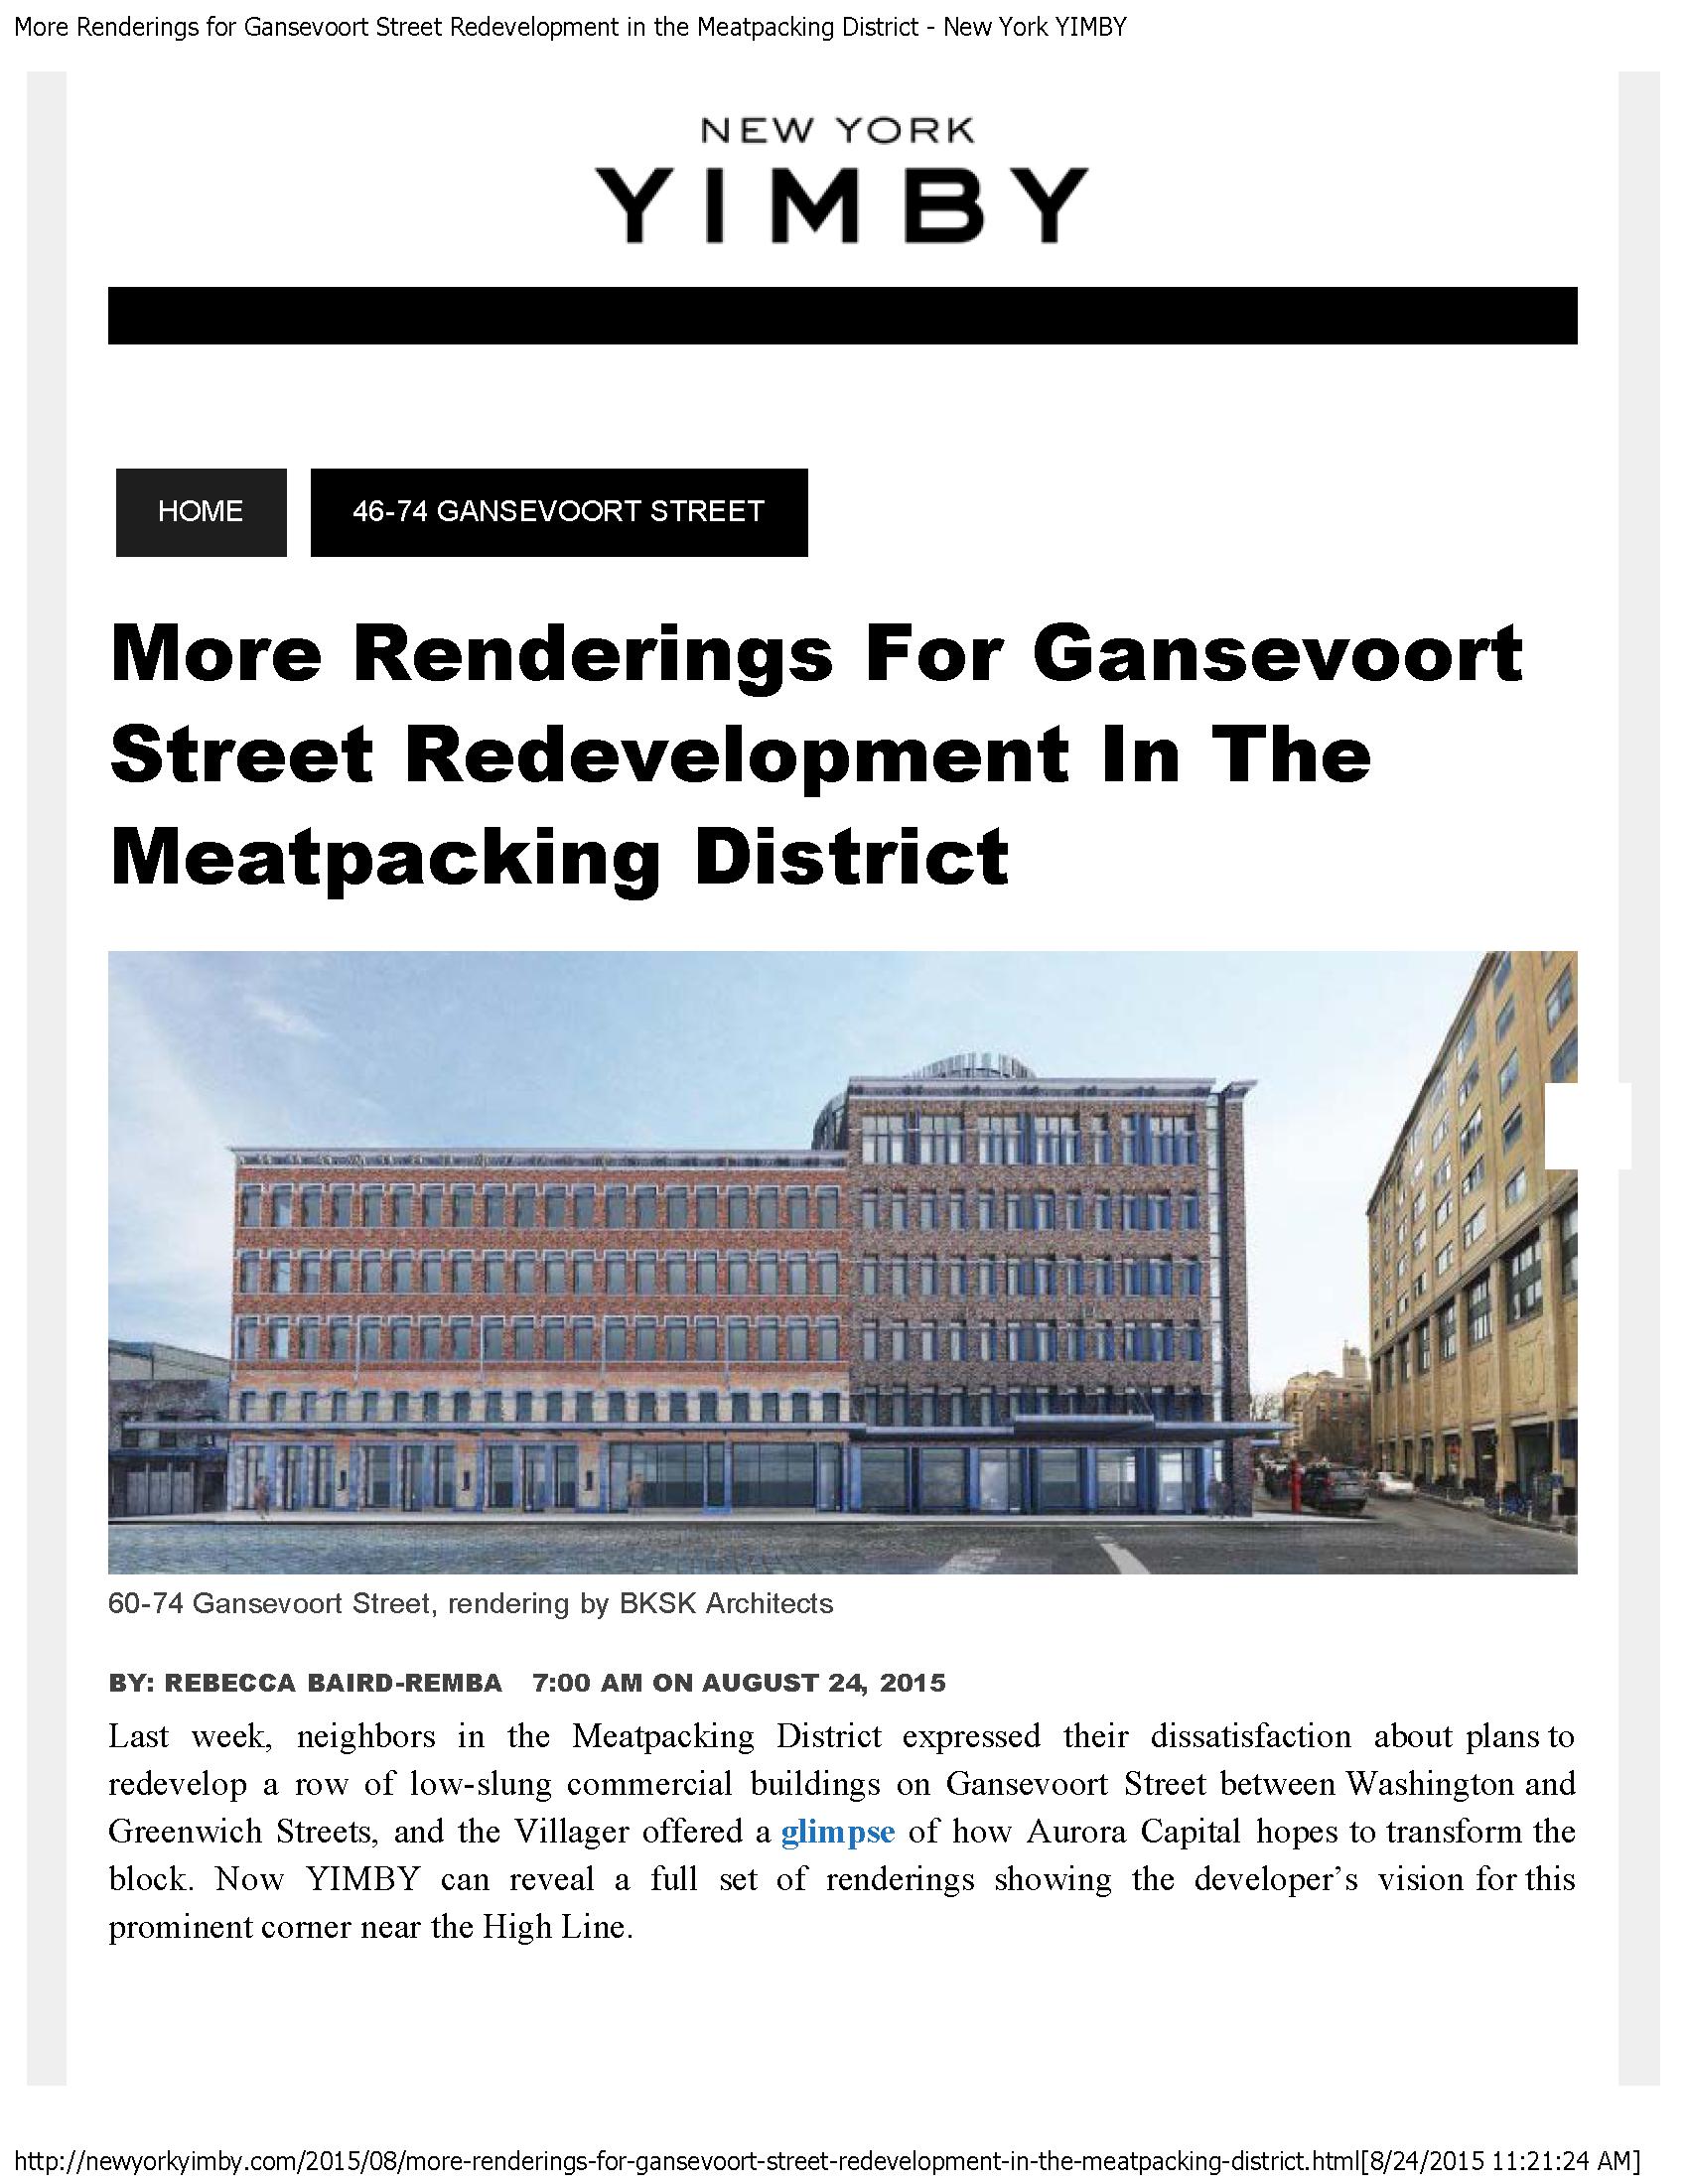 MORE RENDERINGS FOR GANSEVOORT STREET REDEVELOPMENT IN THE MEATPACKING DISTRICT